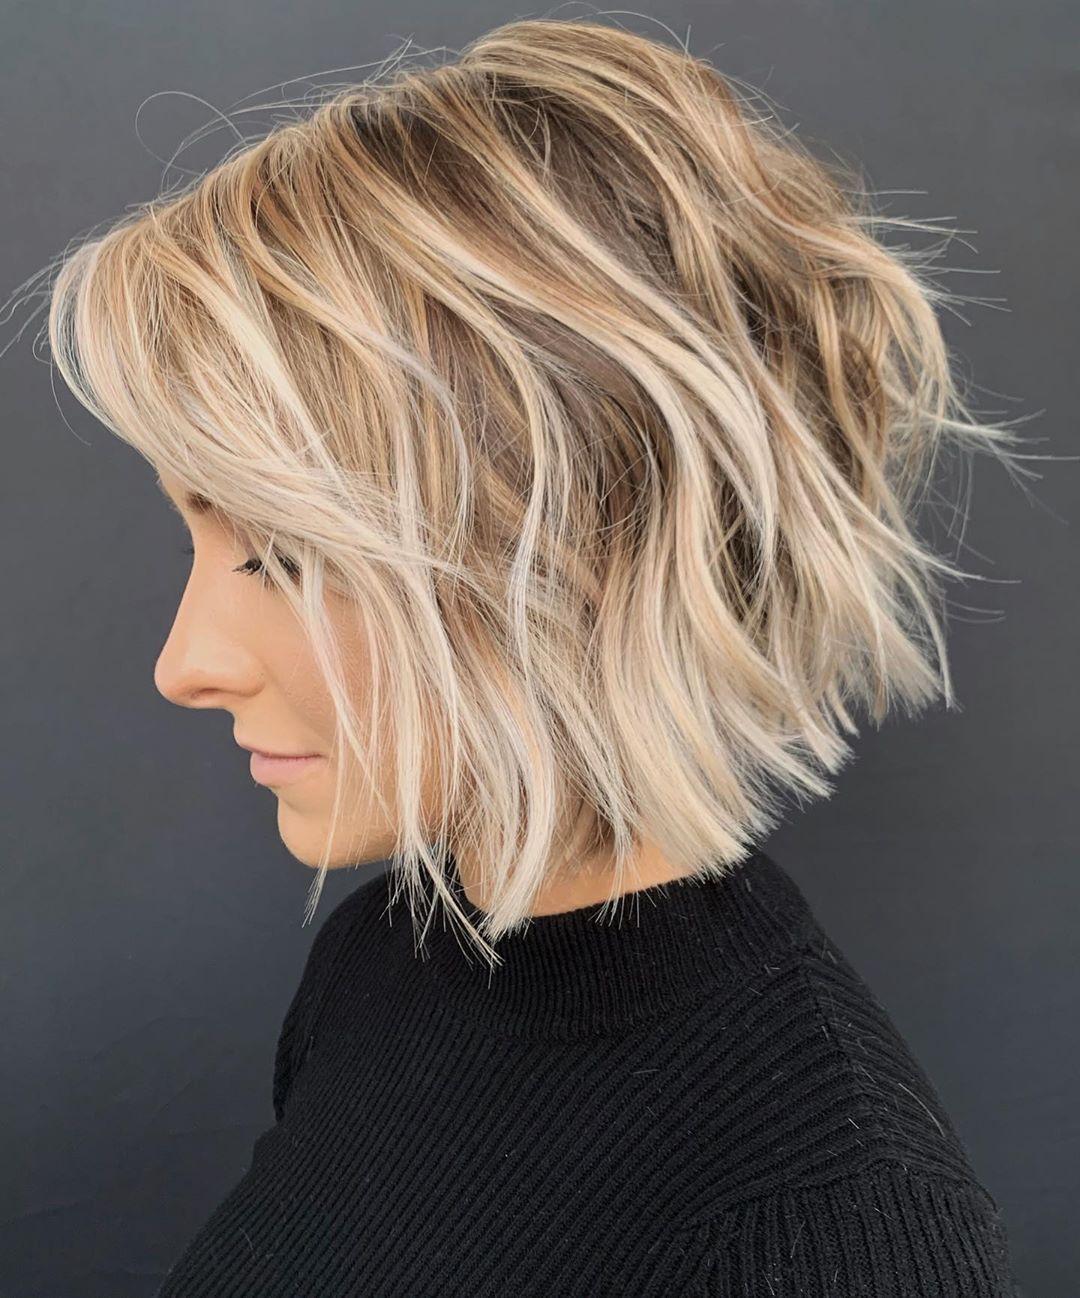 womens haircuts 2020